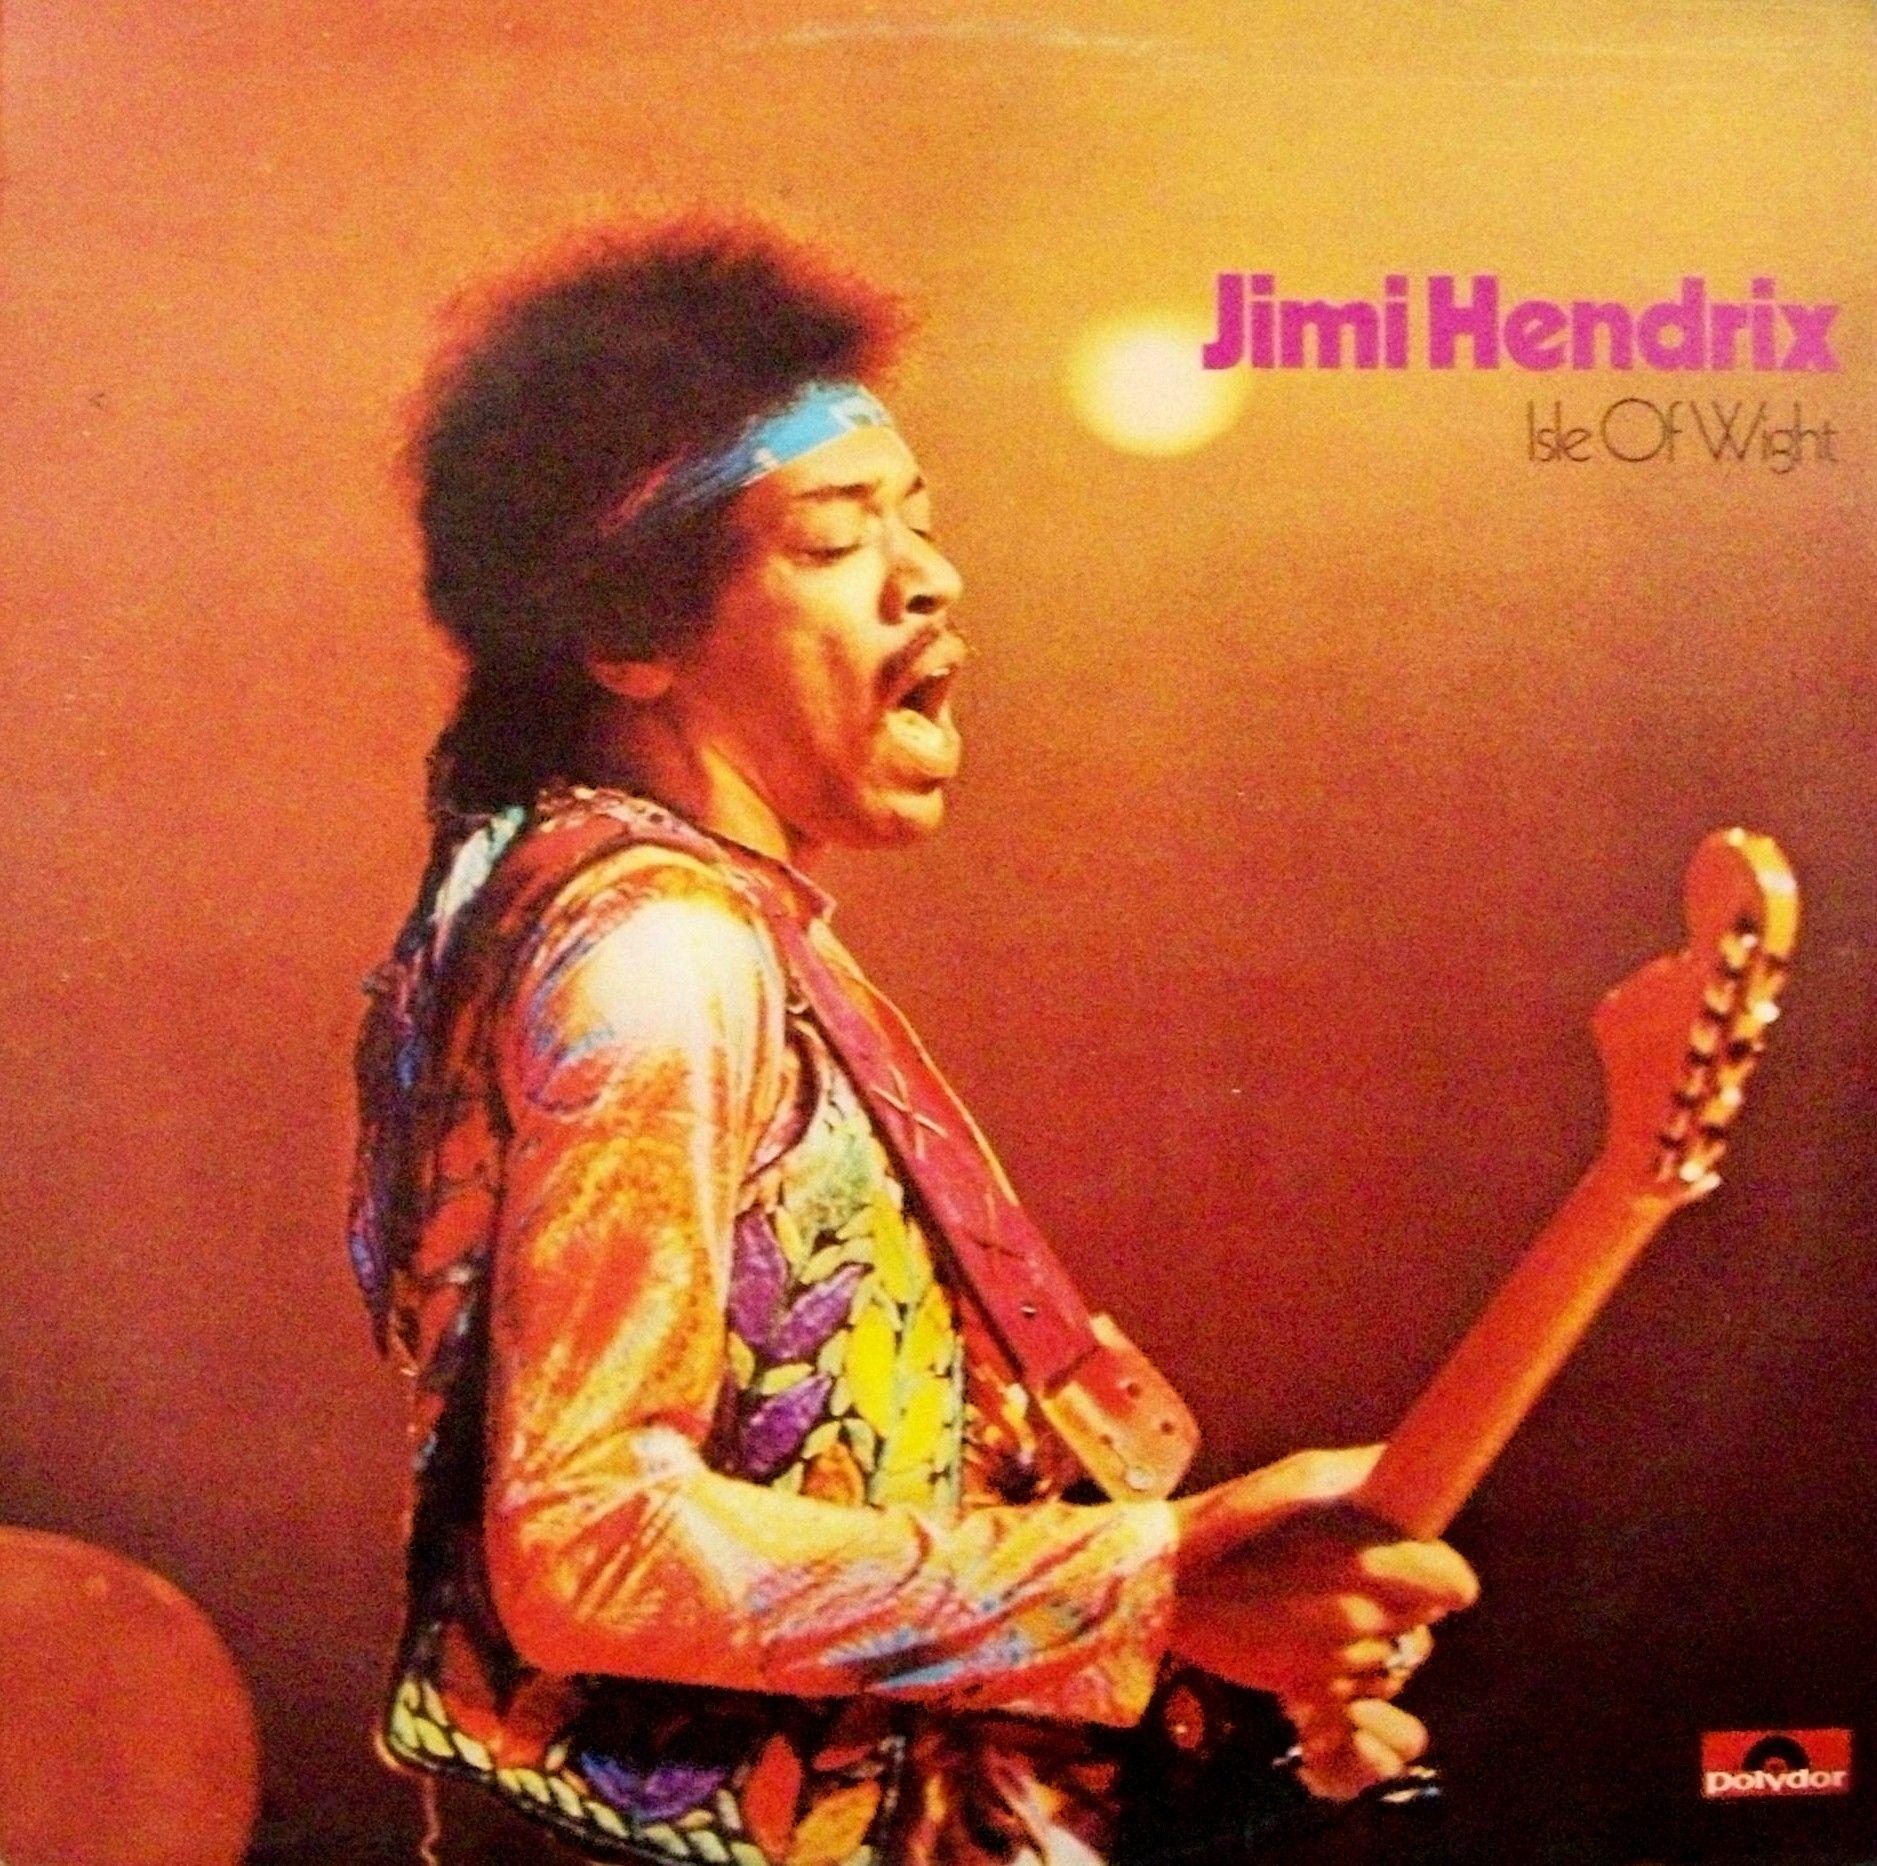 jimi hendrix live album - Google zoeken | The Album Cover